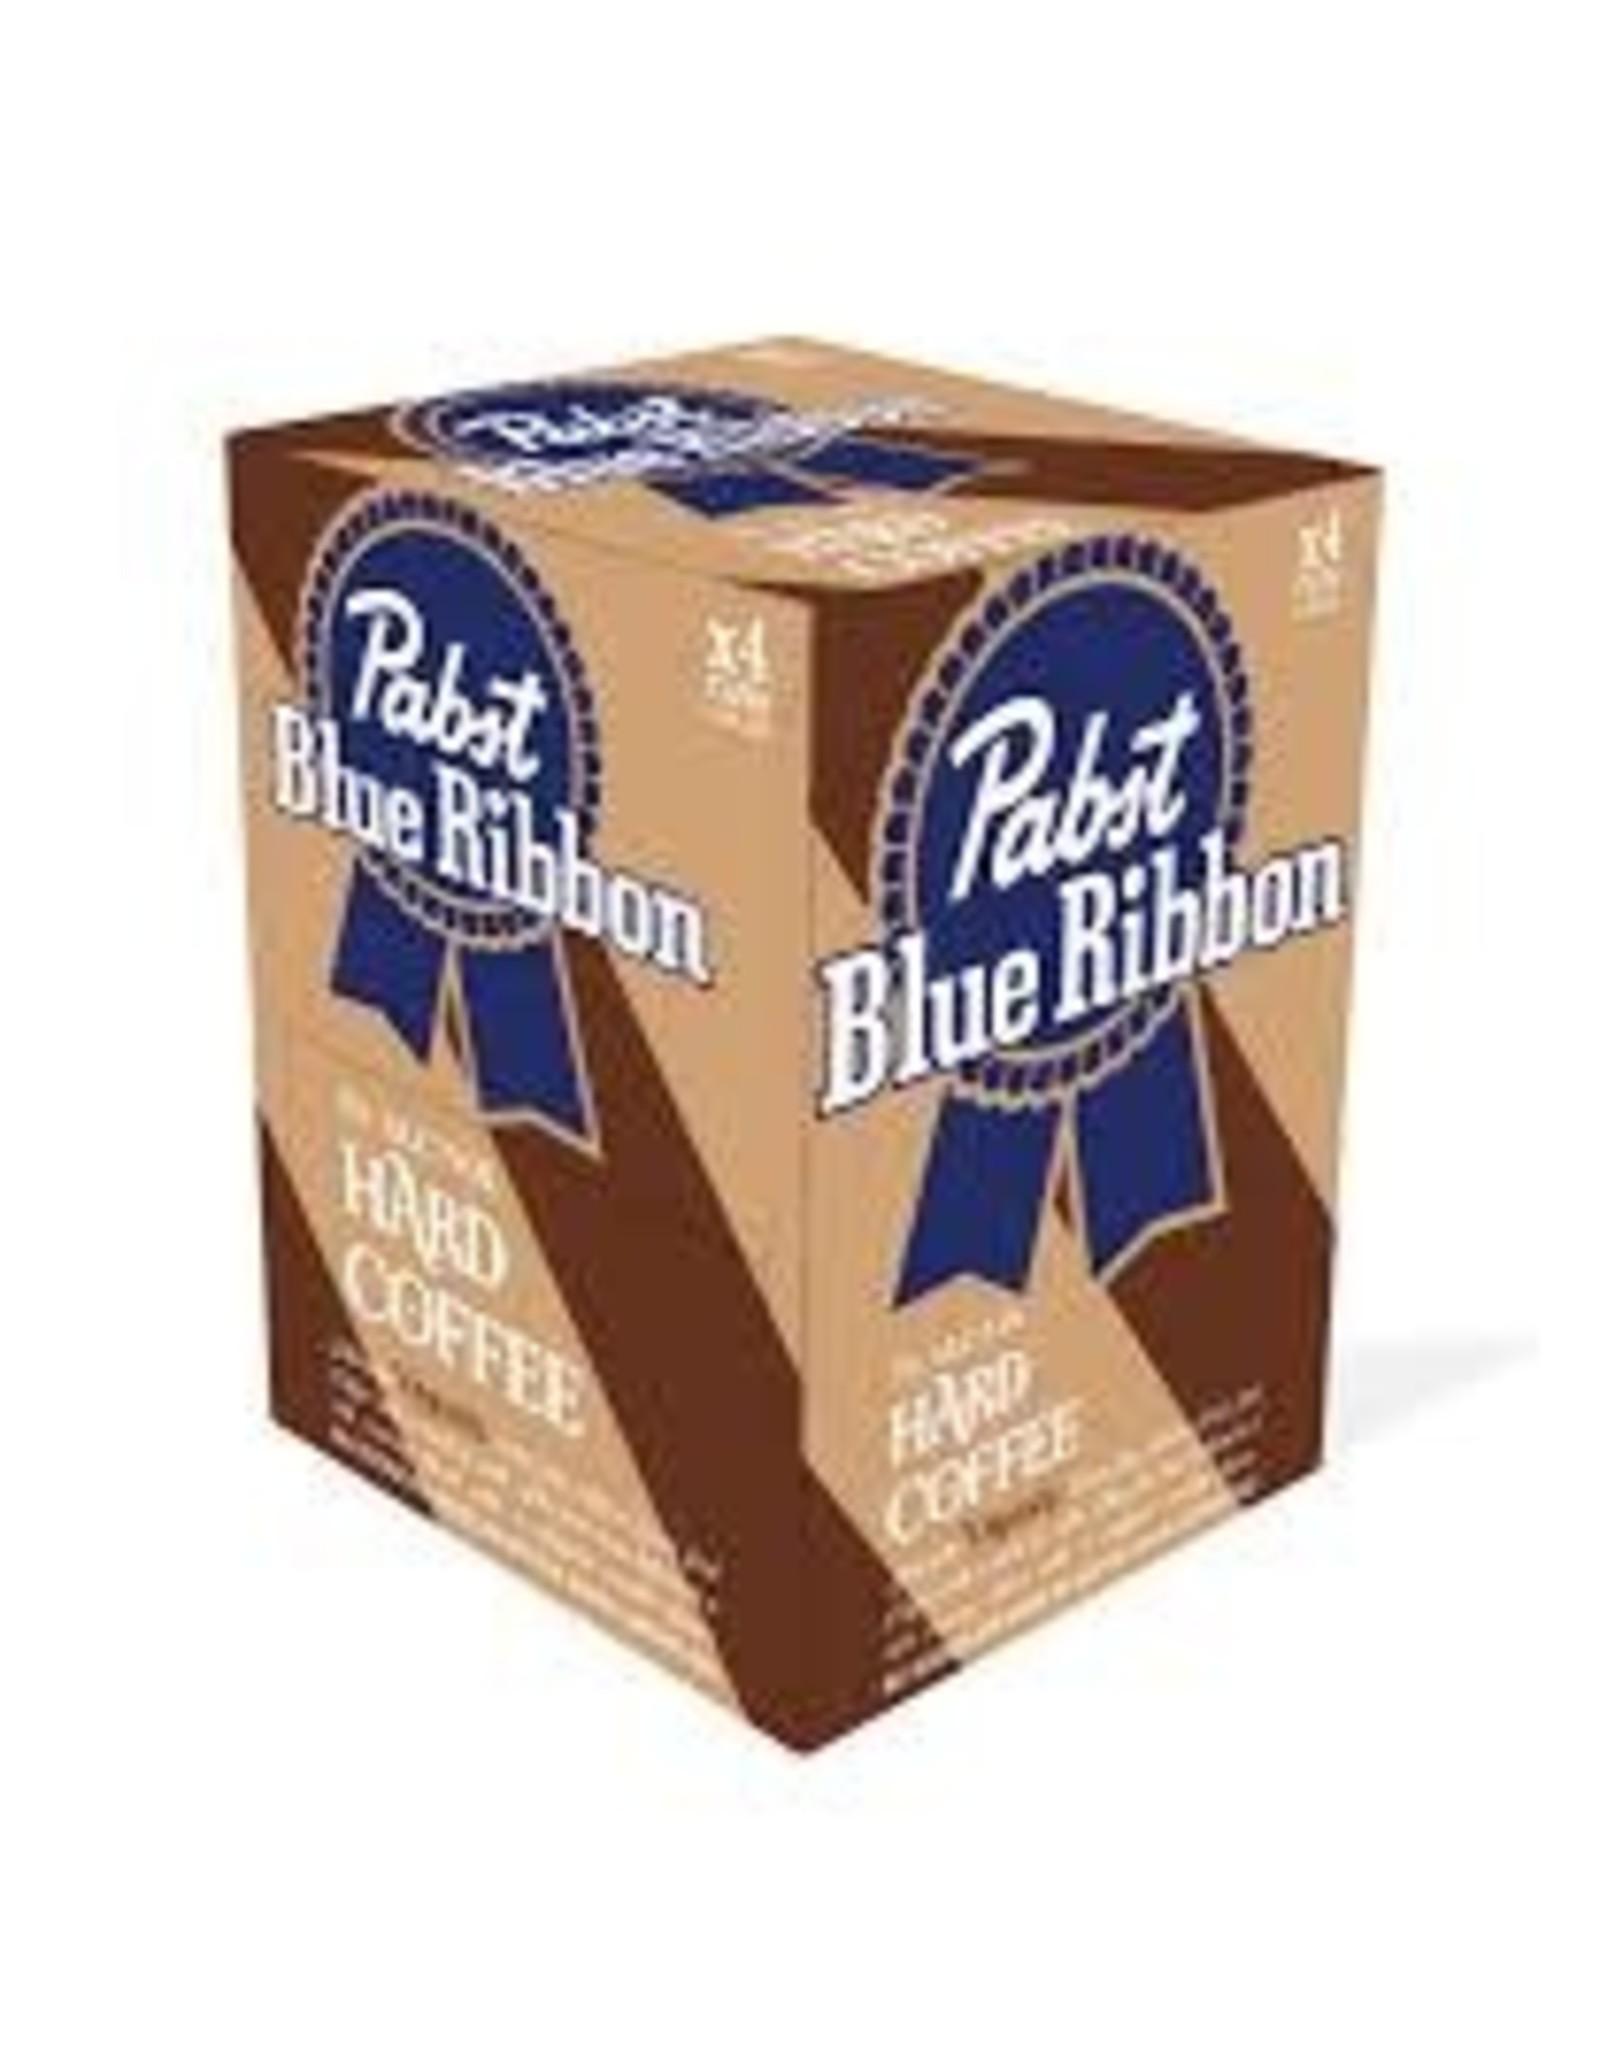 Pabst Blue Ribbon Pabst Blue Ribbon Hard Coffee 4pk